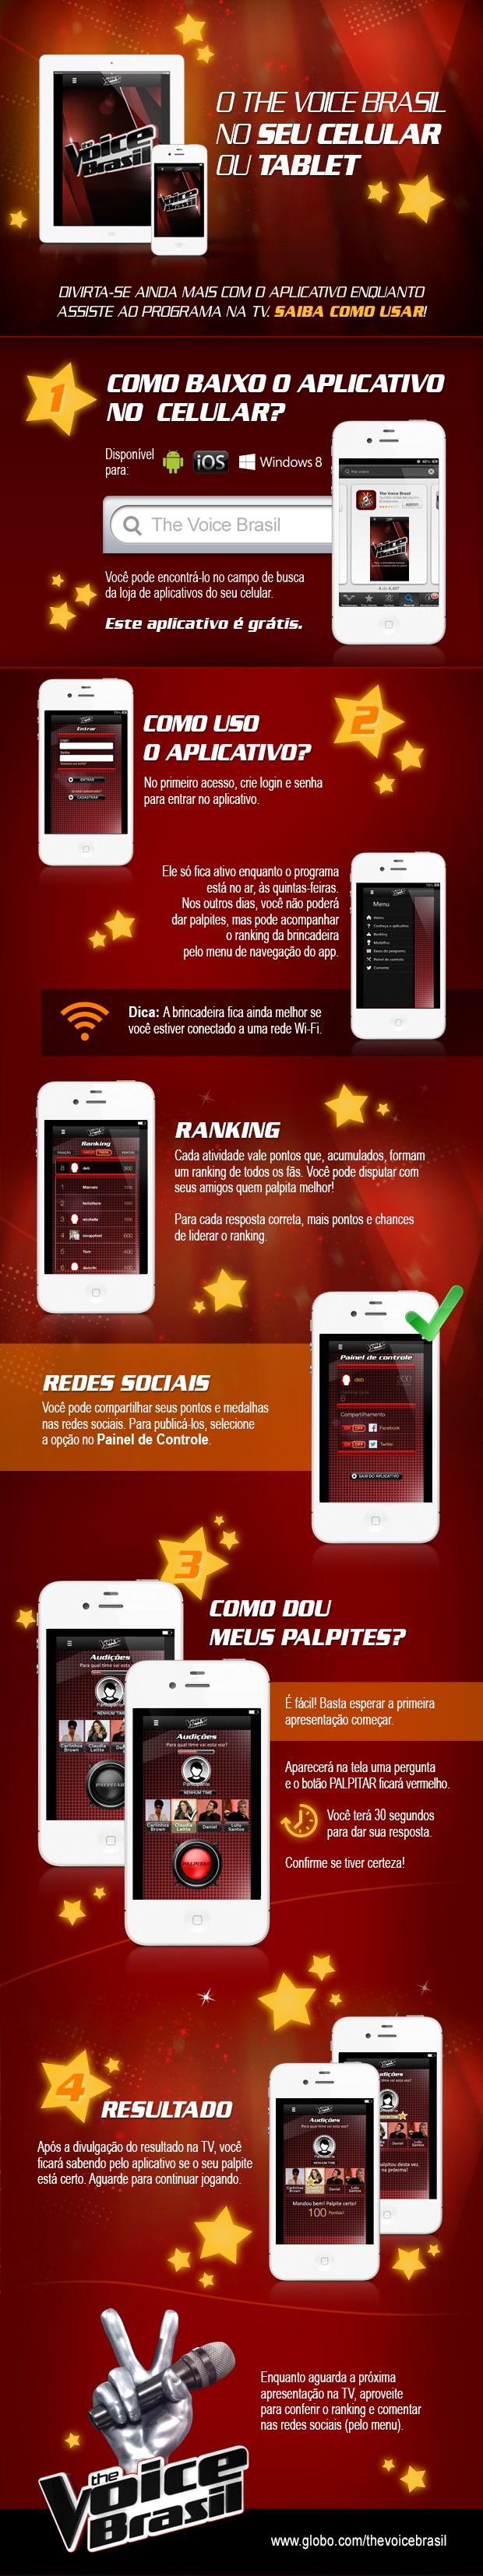 Tutorial aplicativo atualizado (Foto: Tv Globo/ The Voice Brasil)